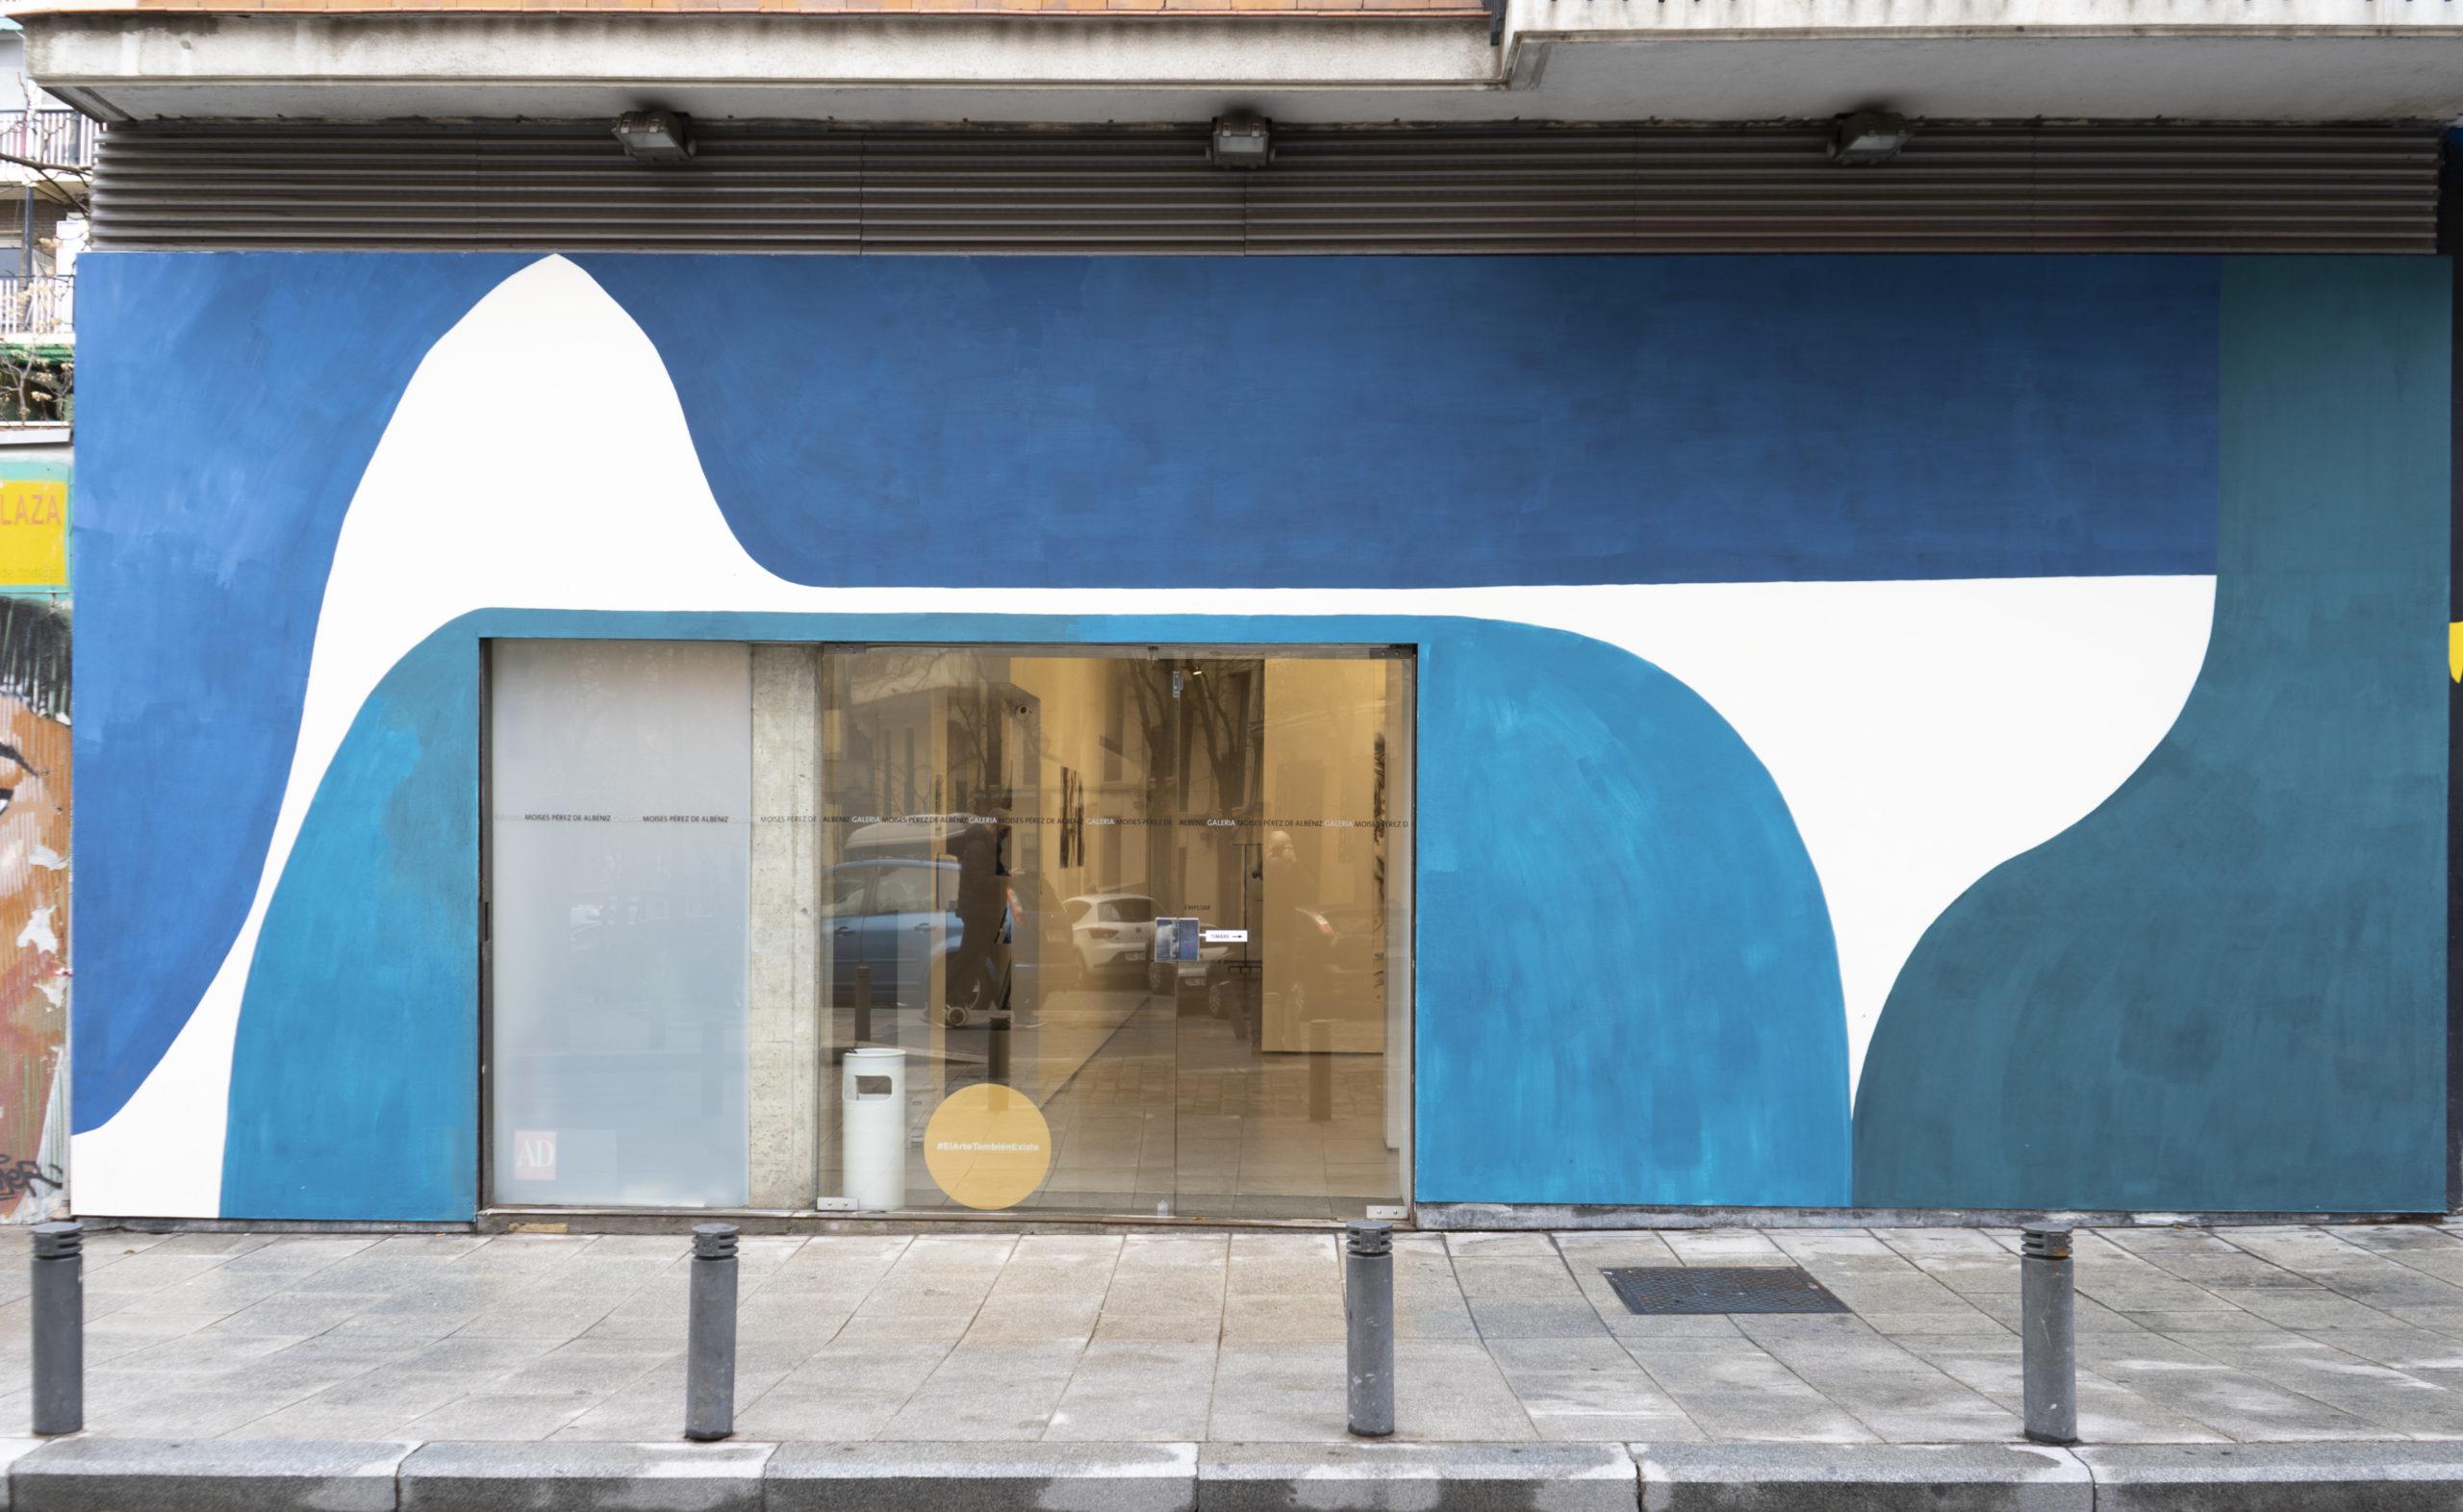 Galería Moisés Pérez de Albéniz, Exposiciones Madrid